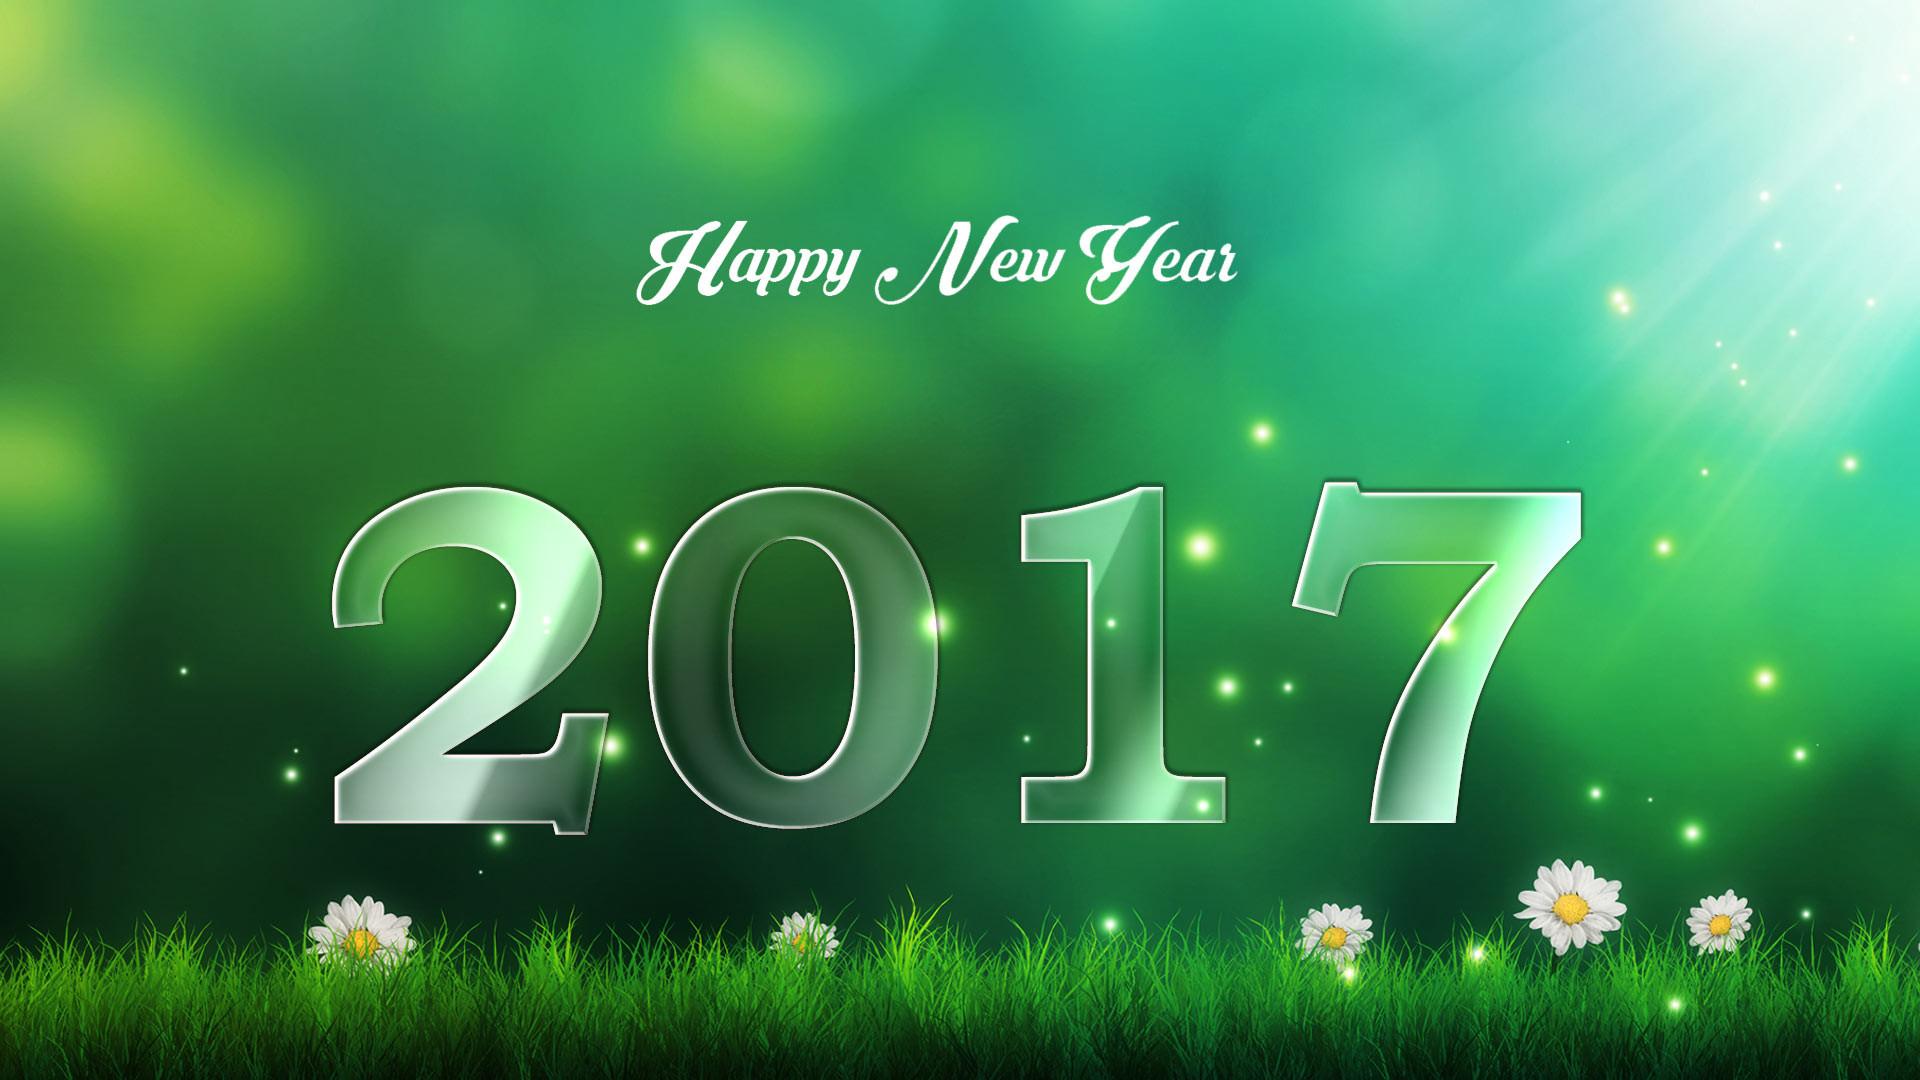 Nature Wallpaper Happy New Year 2017